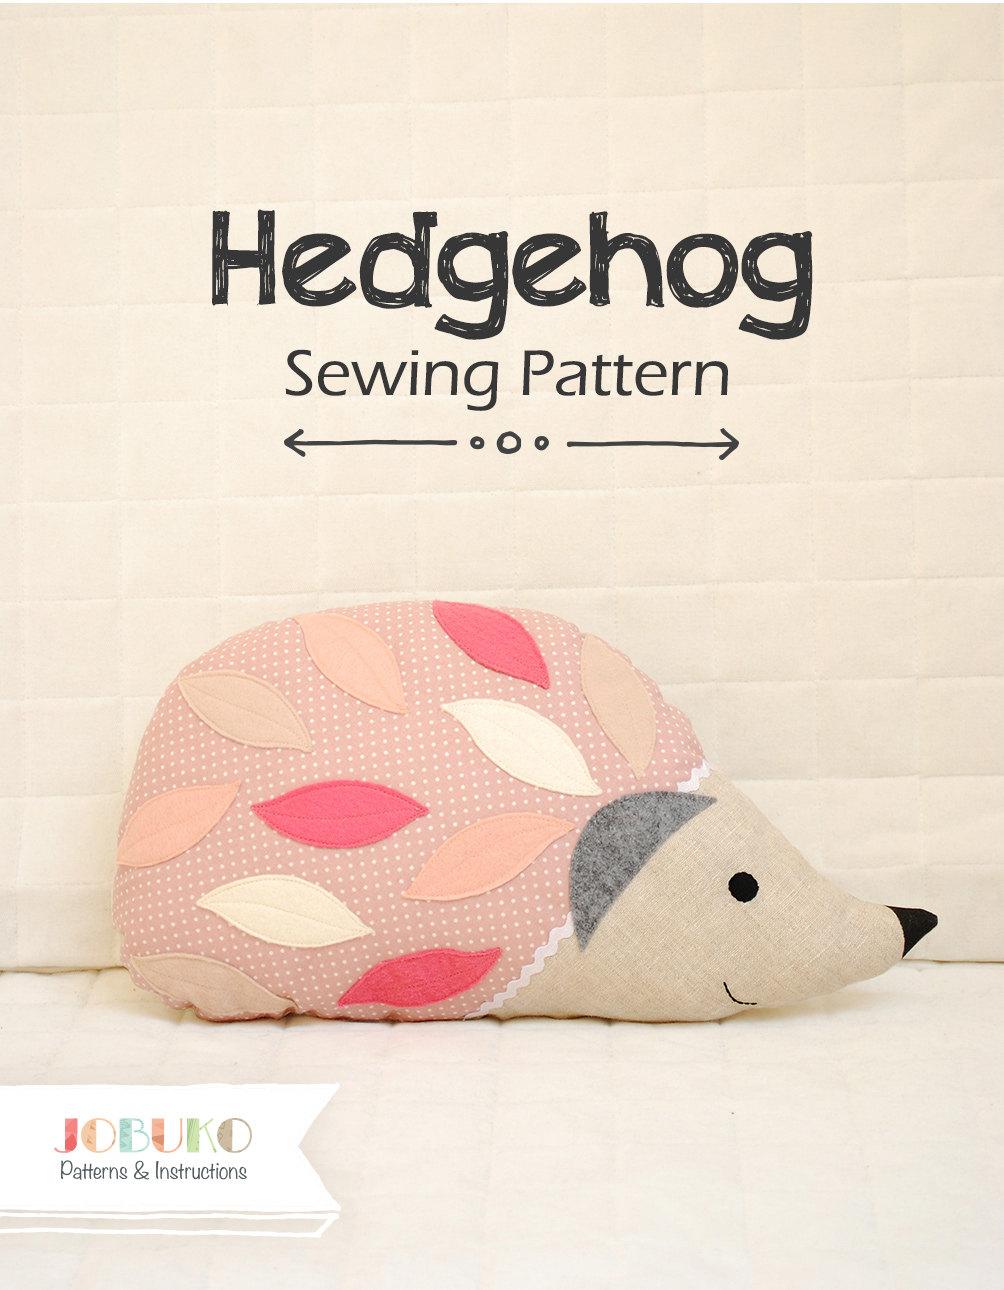 Animal Pillow Patterns To Sew : Hedgehog PDF Sewing Pattern Pillow Tutorial Stuffed Animal